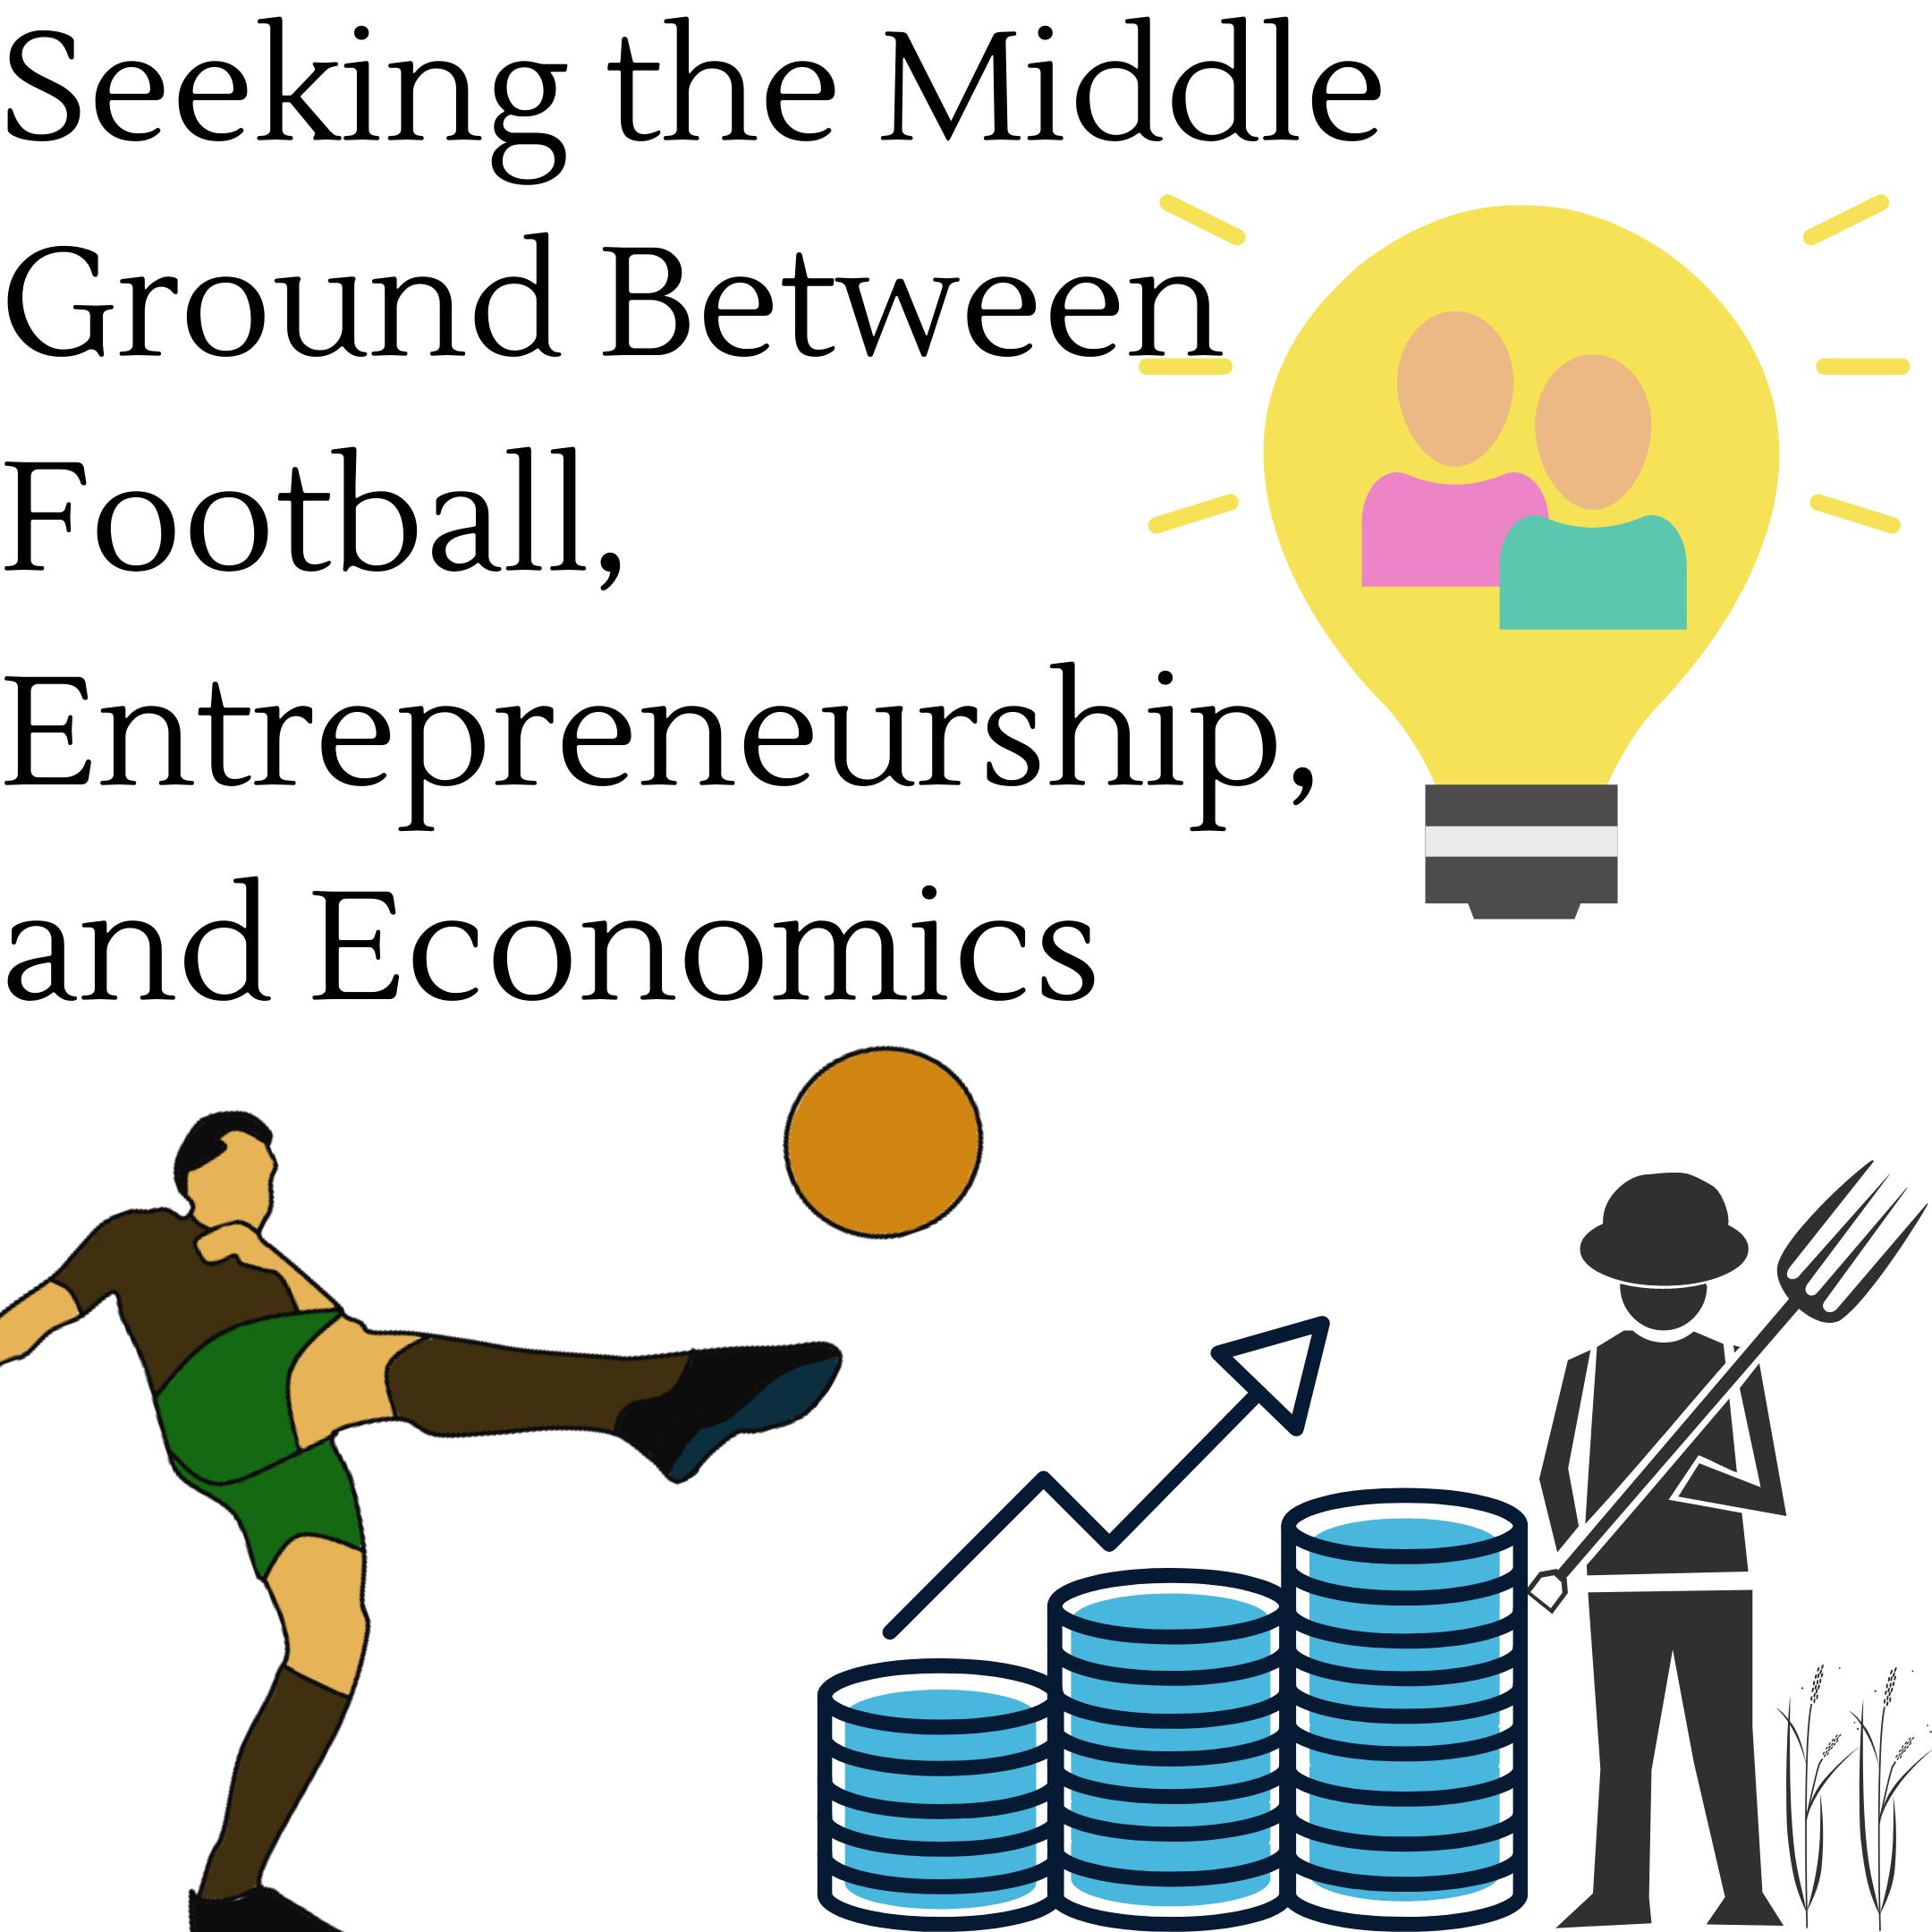 Choosing Between Football, Entrepreneurship, and Economics